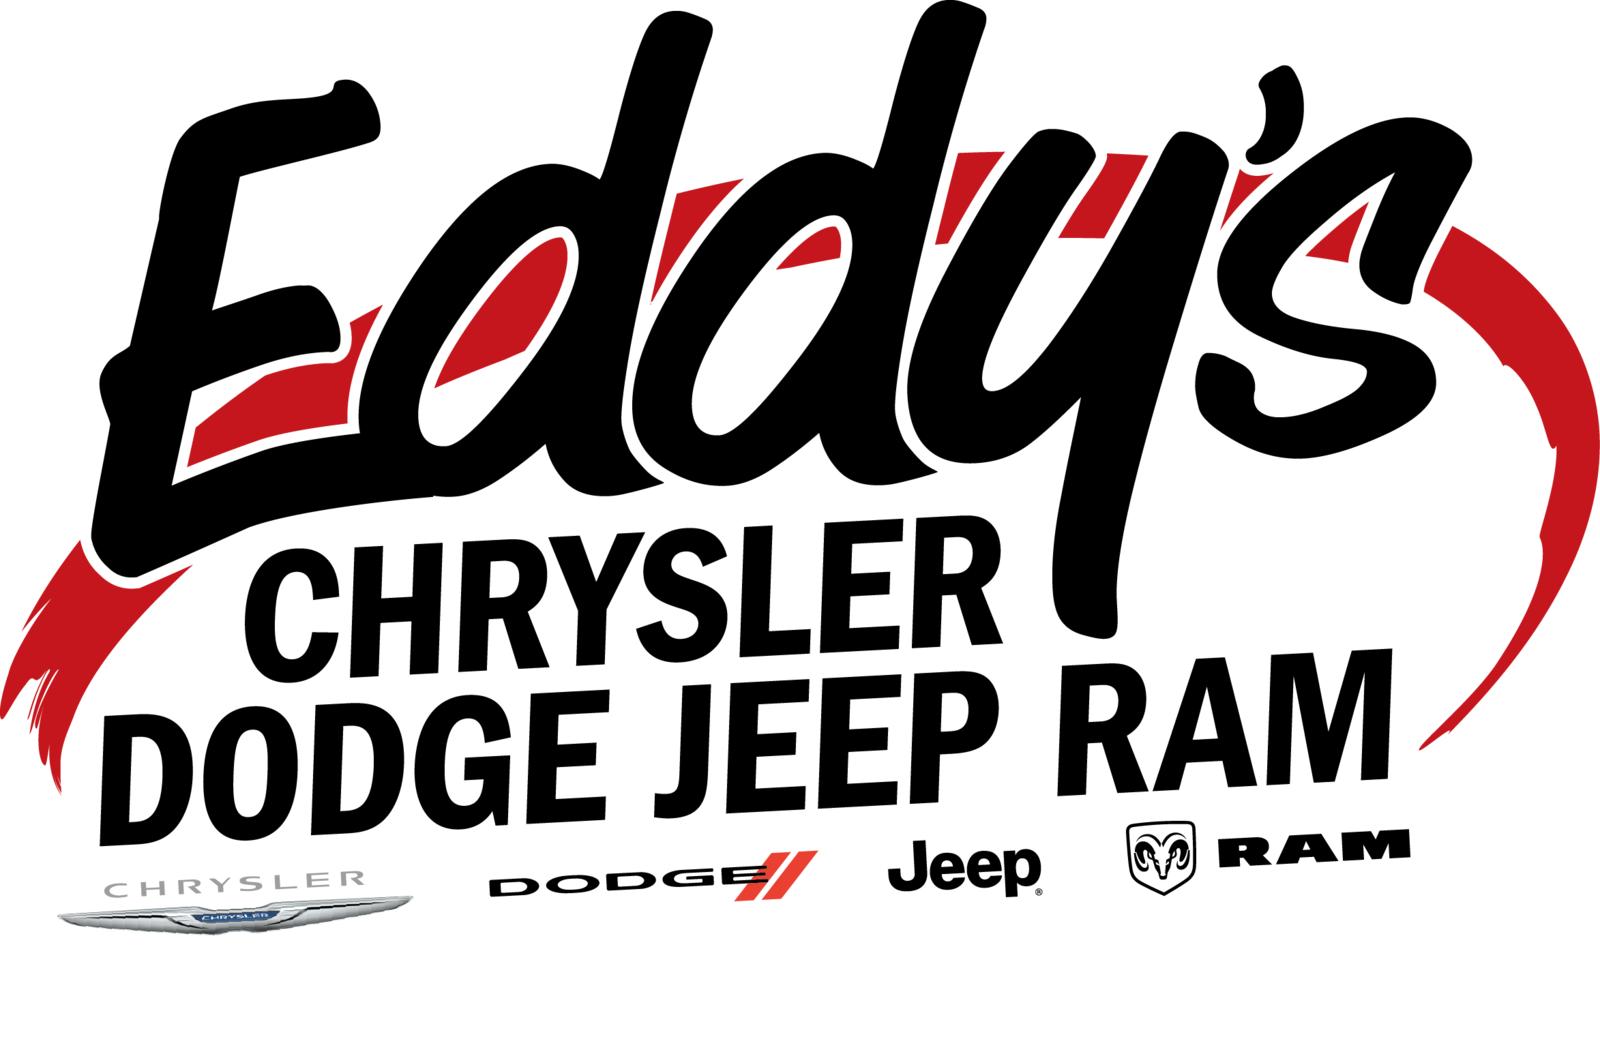 Eddys Chrysler Dodge Jeep Ram Wichita KS Read Consumer - Midway jeep chrysler dodge ram